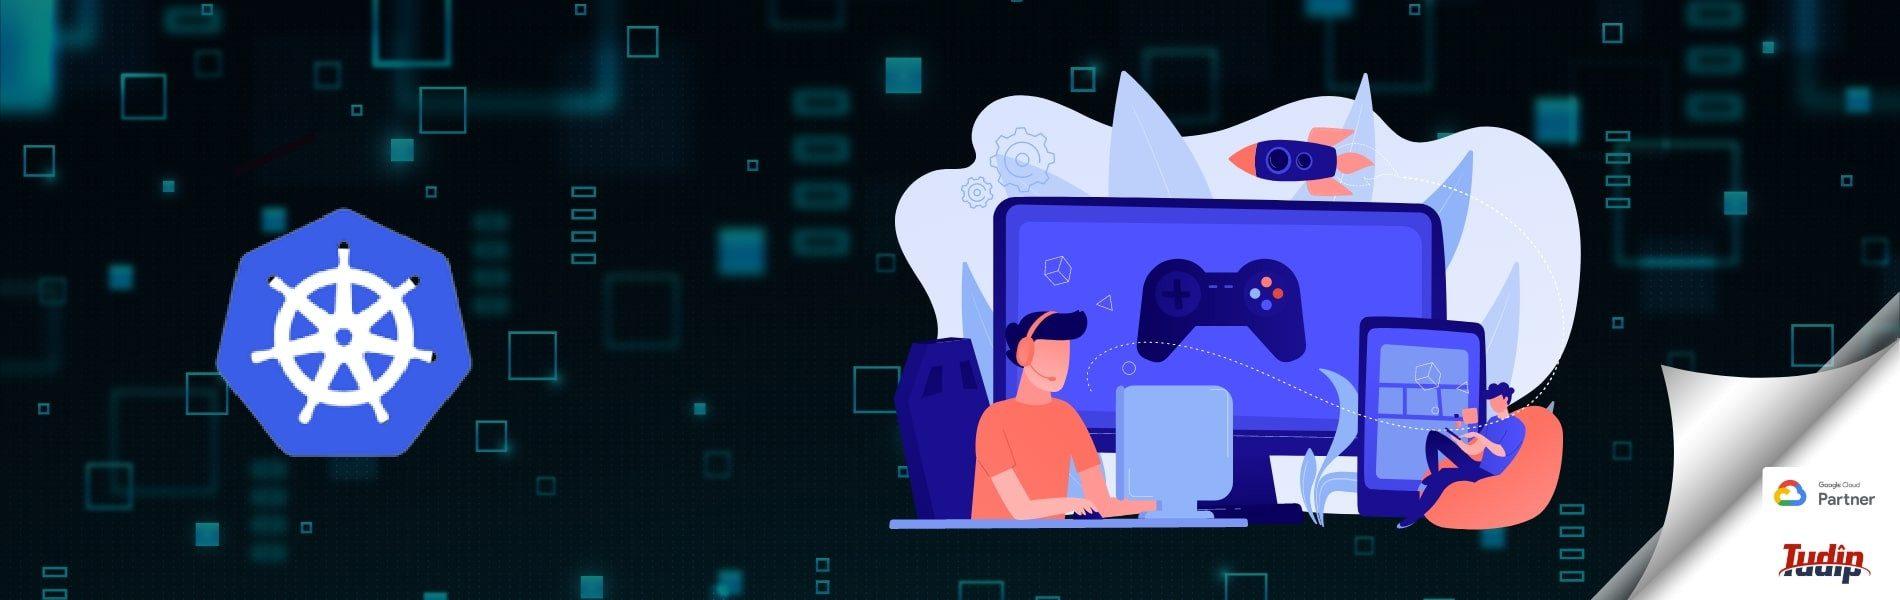 Google Kubernetes Engine for running dedicated Game server